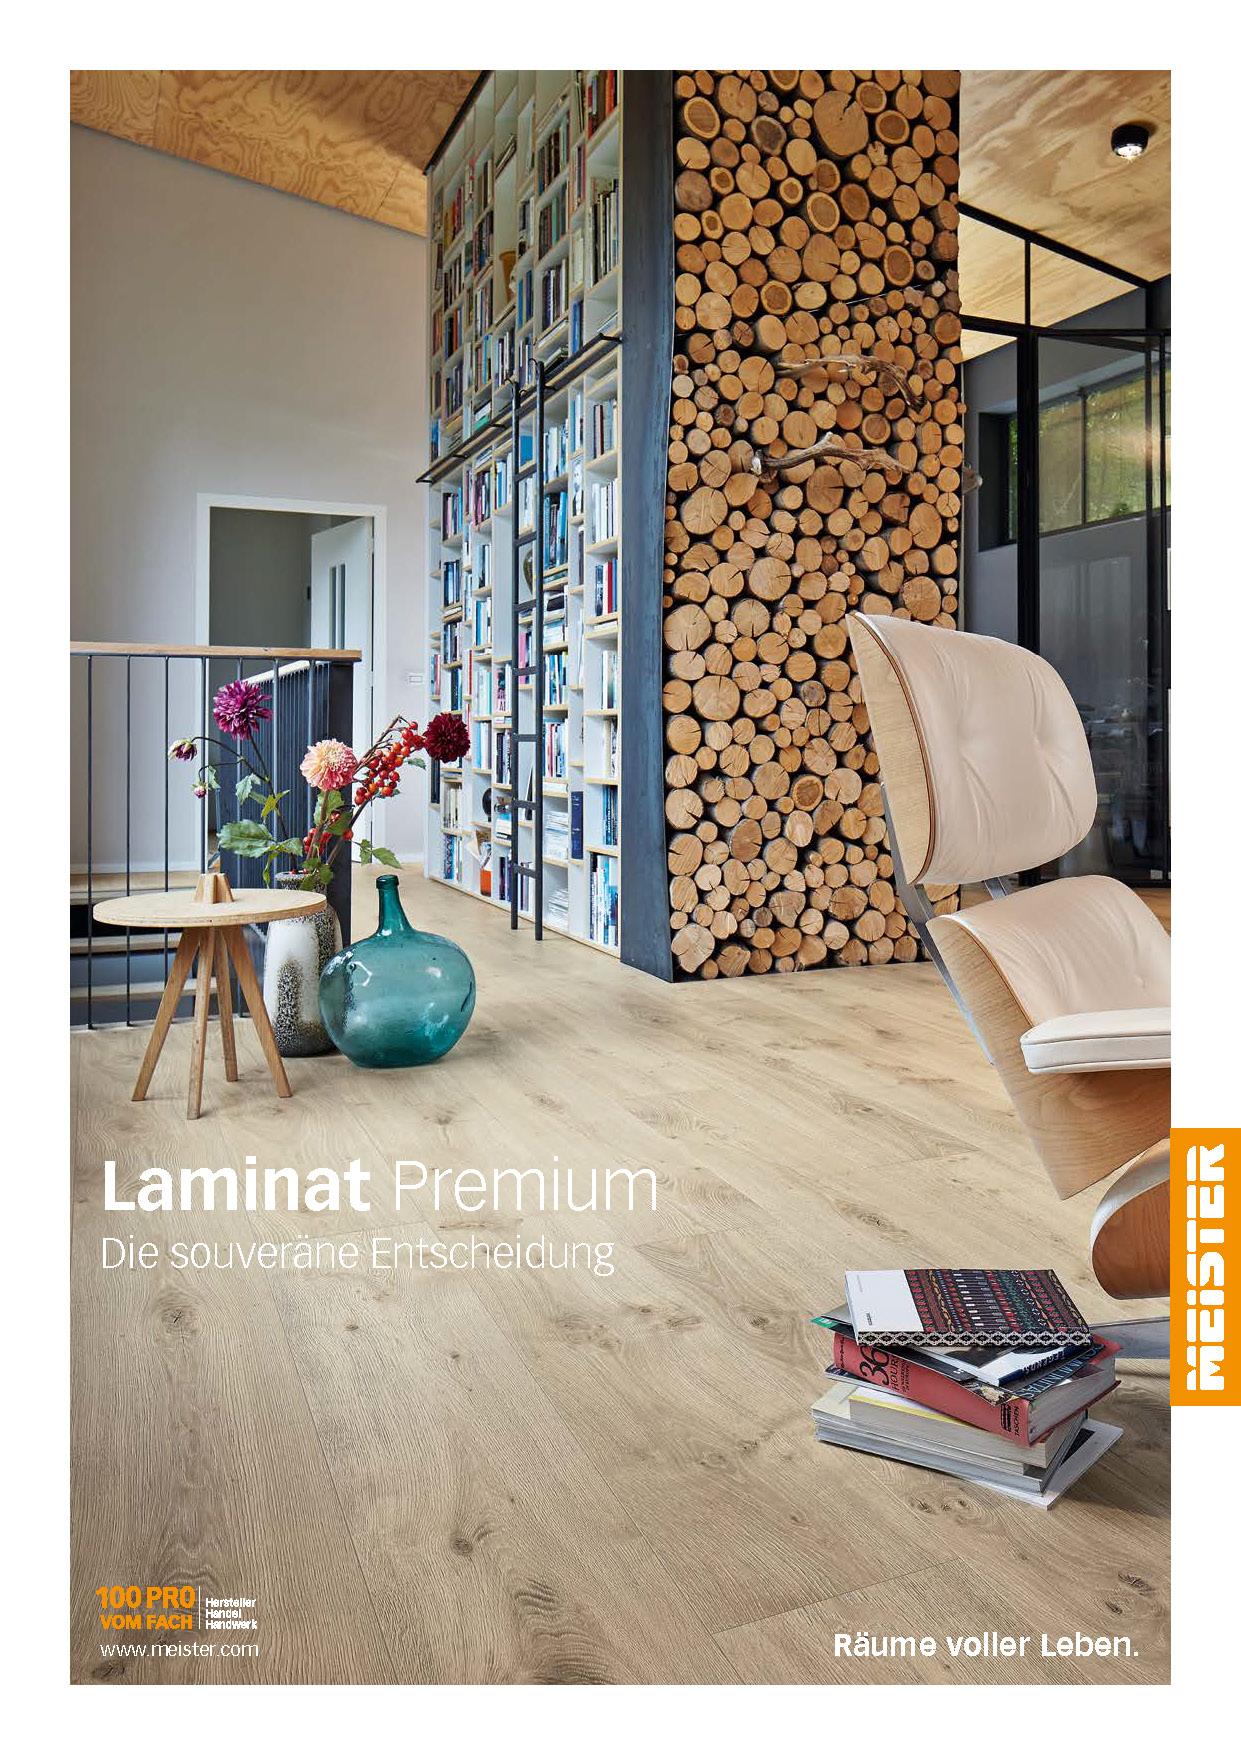 parkett ingolstadt weigart gmbh ingolstadt teppichb den parkett linoleum parkettboden. Black Bedroom Furniture Sets. Home Design Ideas